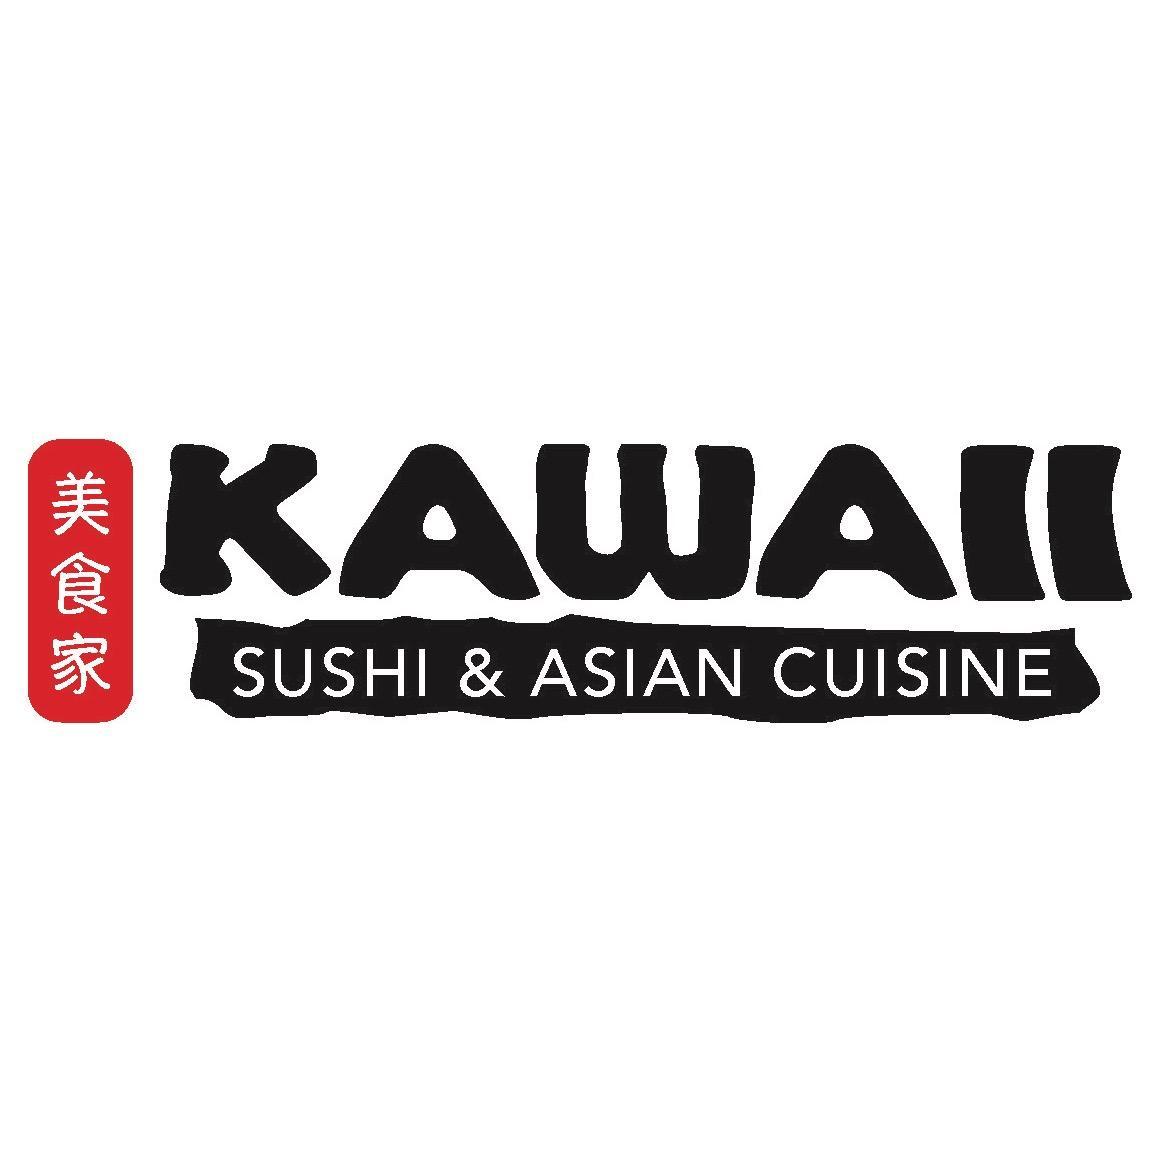 Kawaii Sushi and Asian Cuisine - Deer Valley